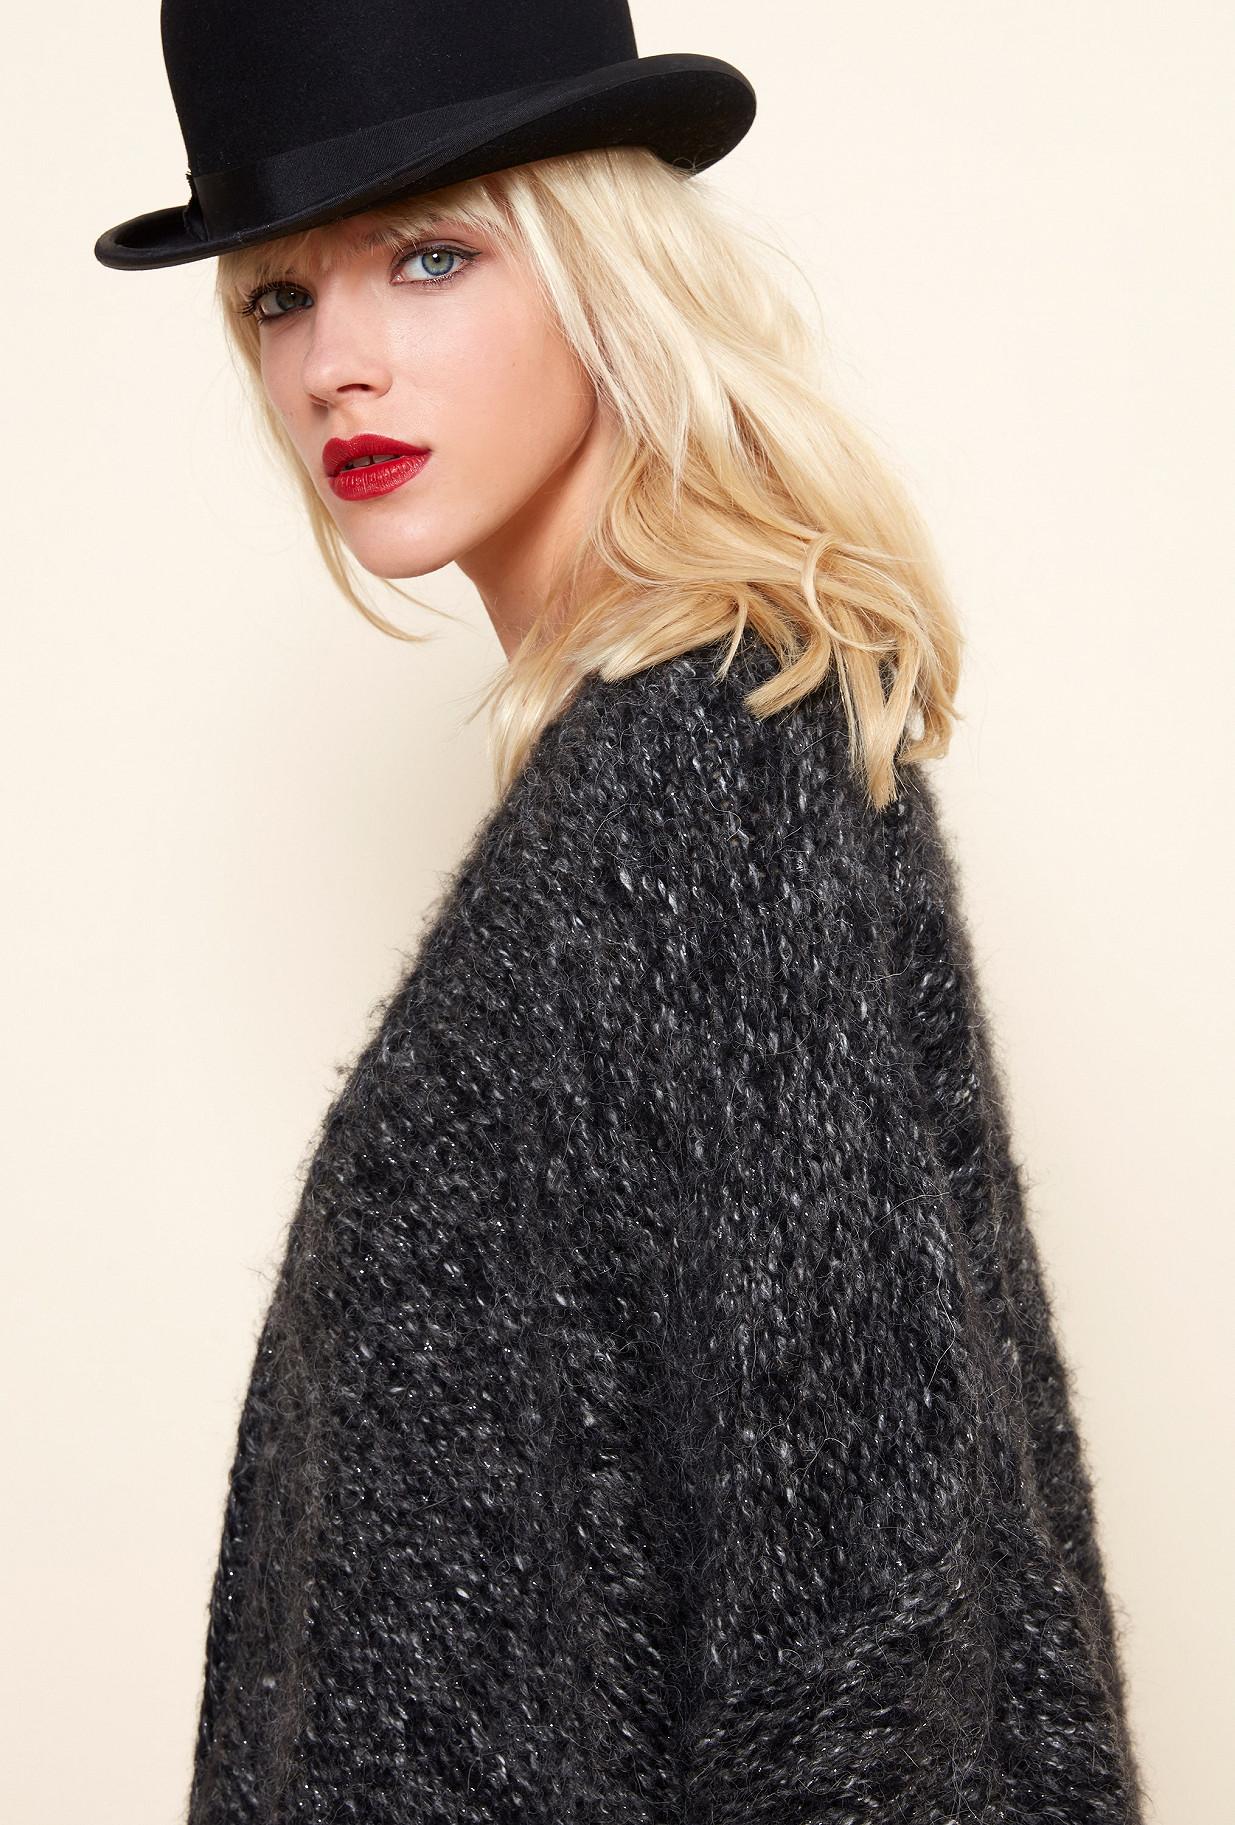 Paris clothes store Knit Appalaches french designer fashion Paris